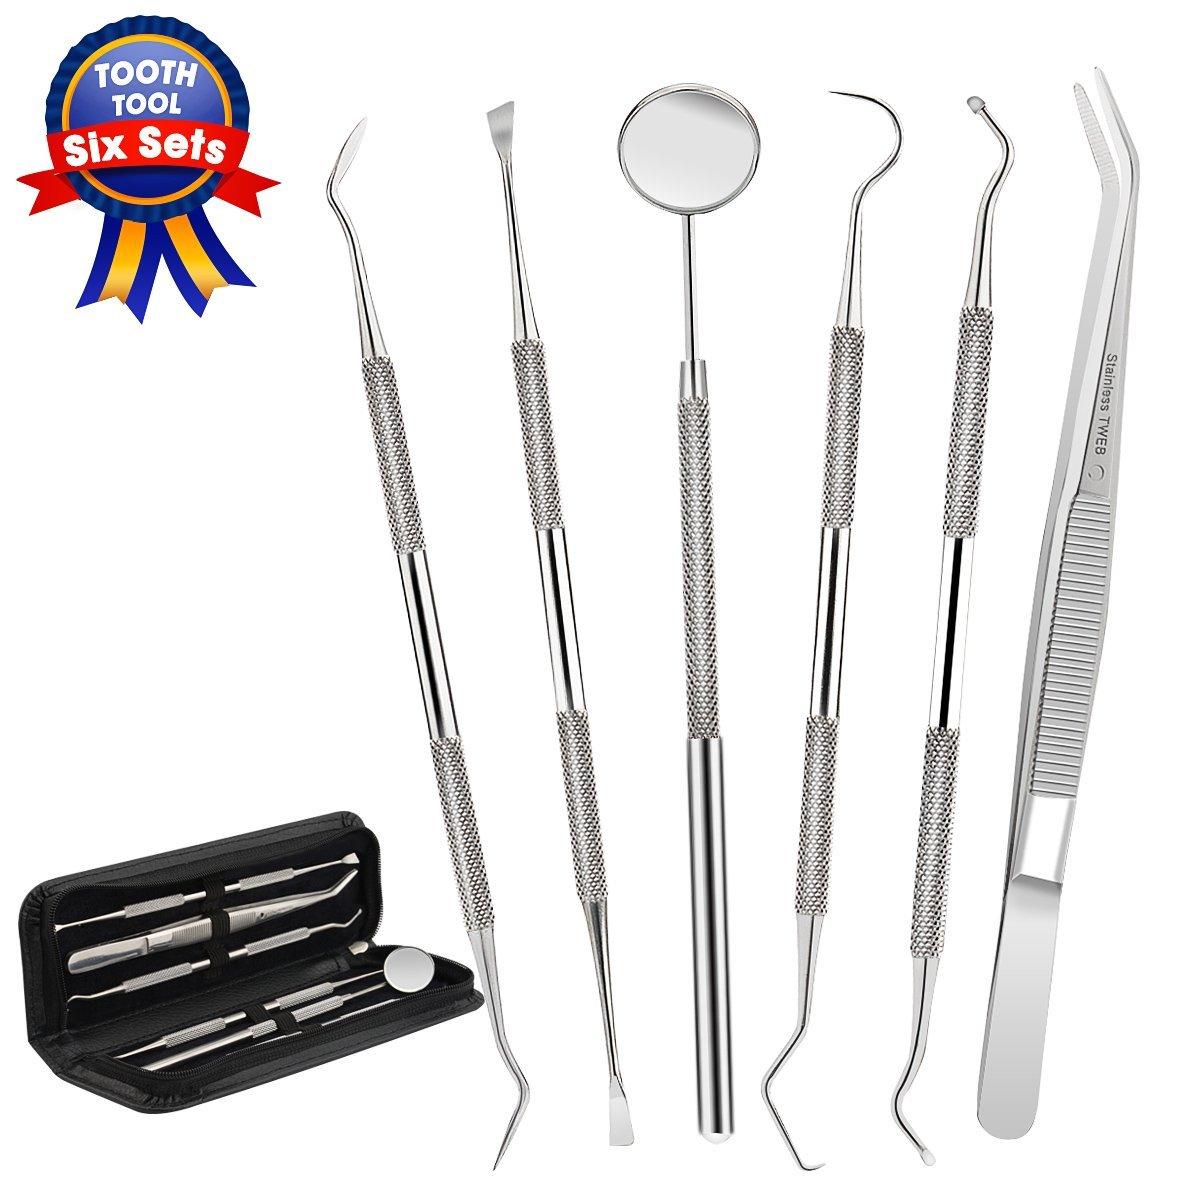 Dental Tools,Patekfly Stainless Steel 6 PACK Dental Pick Dental Floss , Dental Hygiene Tool Set,Tooth Scraper Plaque Tartar Remover Dental Tweezers Gum Floss $5.94 @amazon